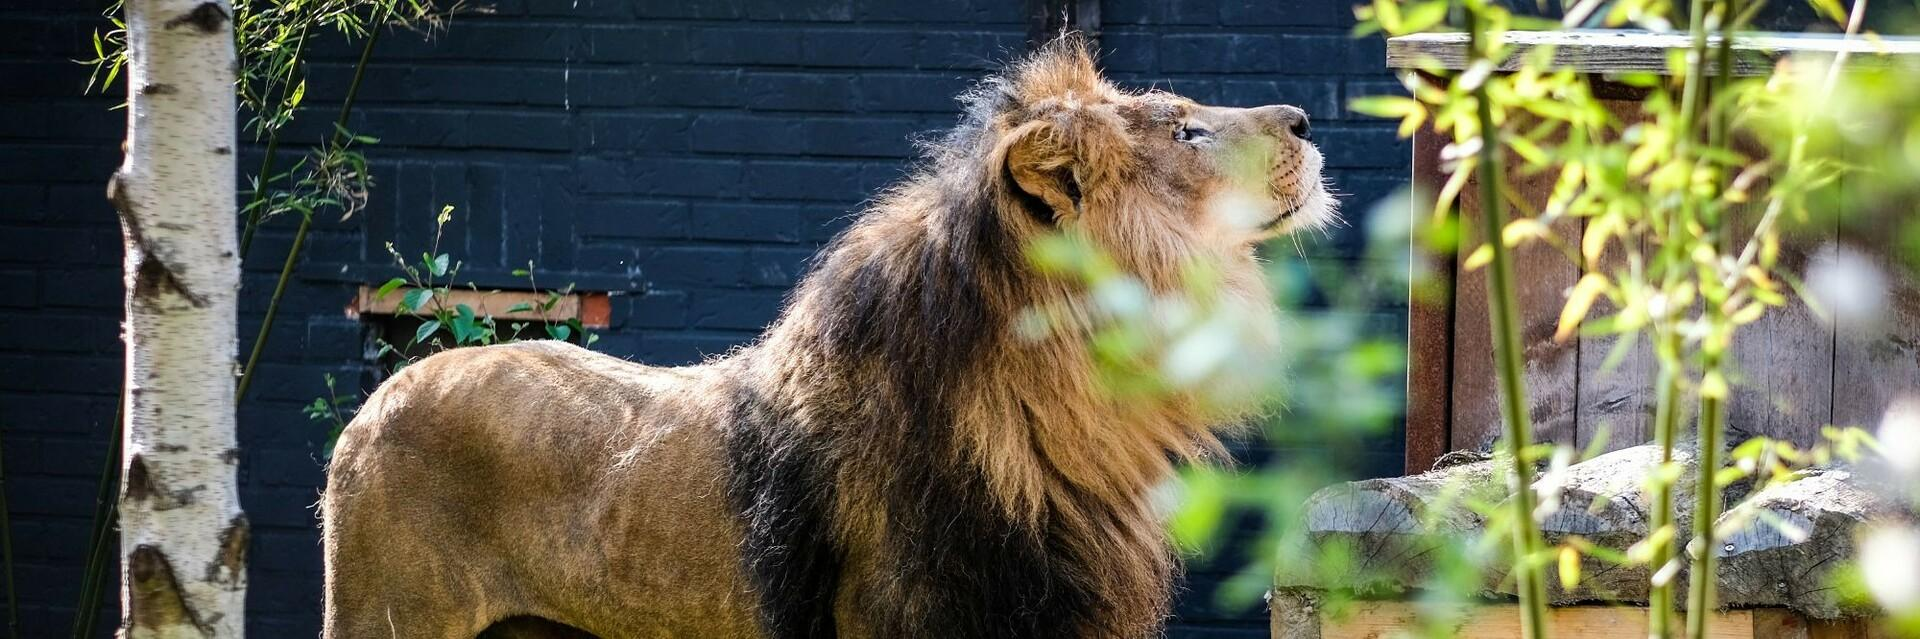 Lion in FELIDA